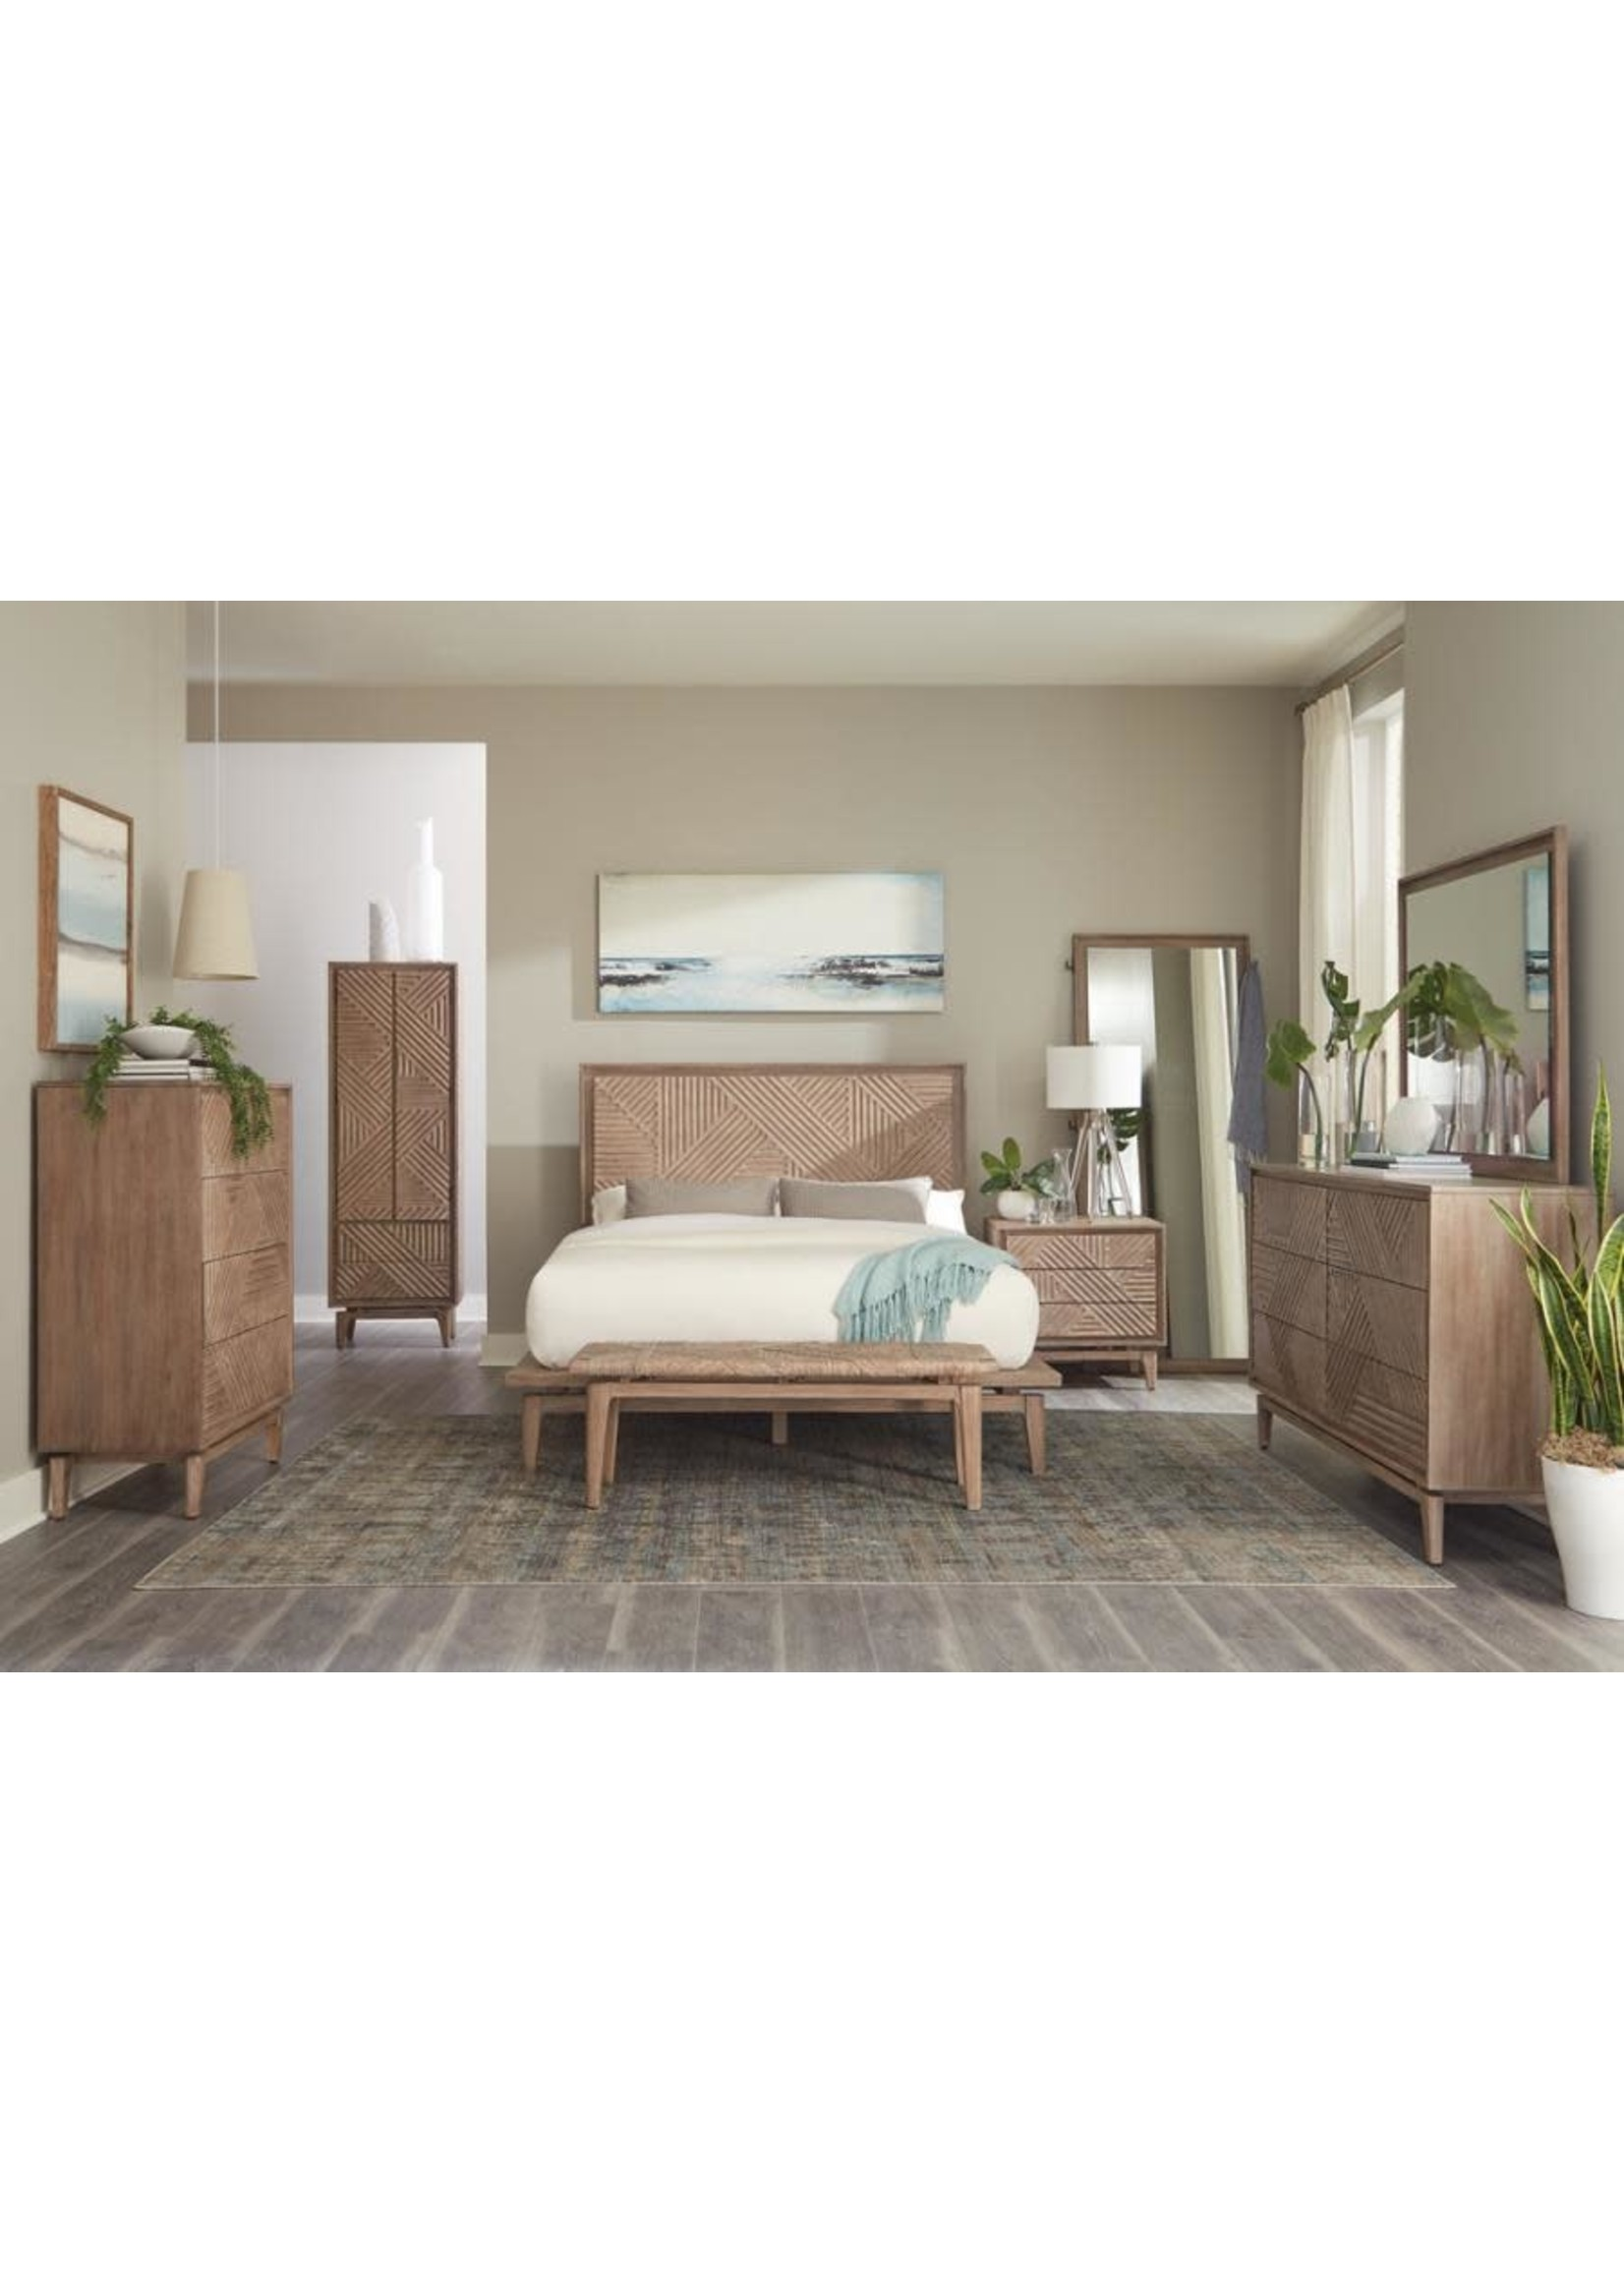 Coaster Furniture COASTER Queen Bed Sandstone